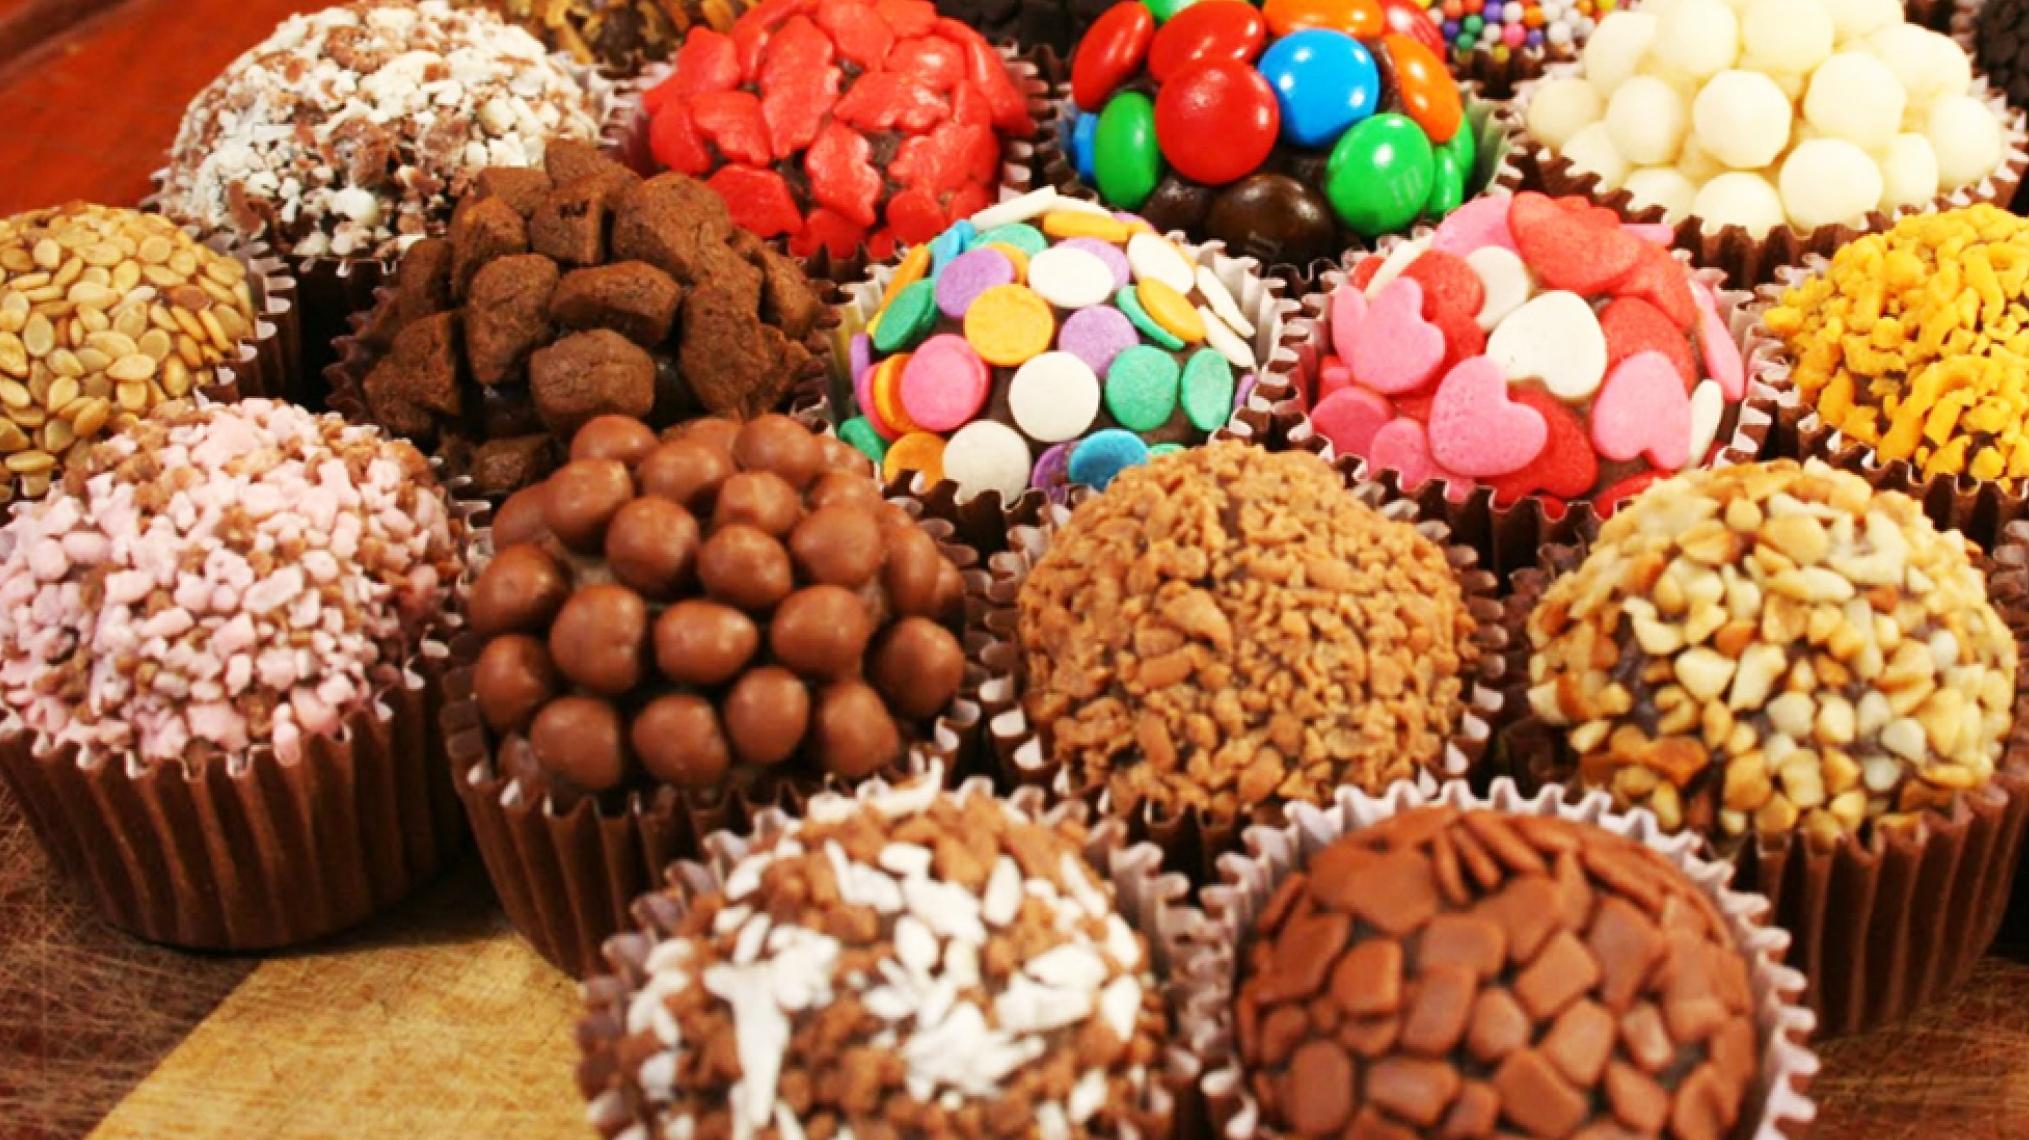 vender doces na rua